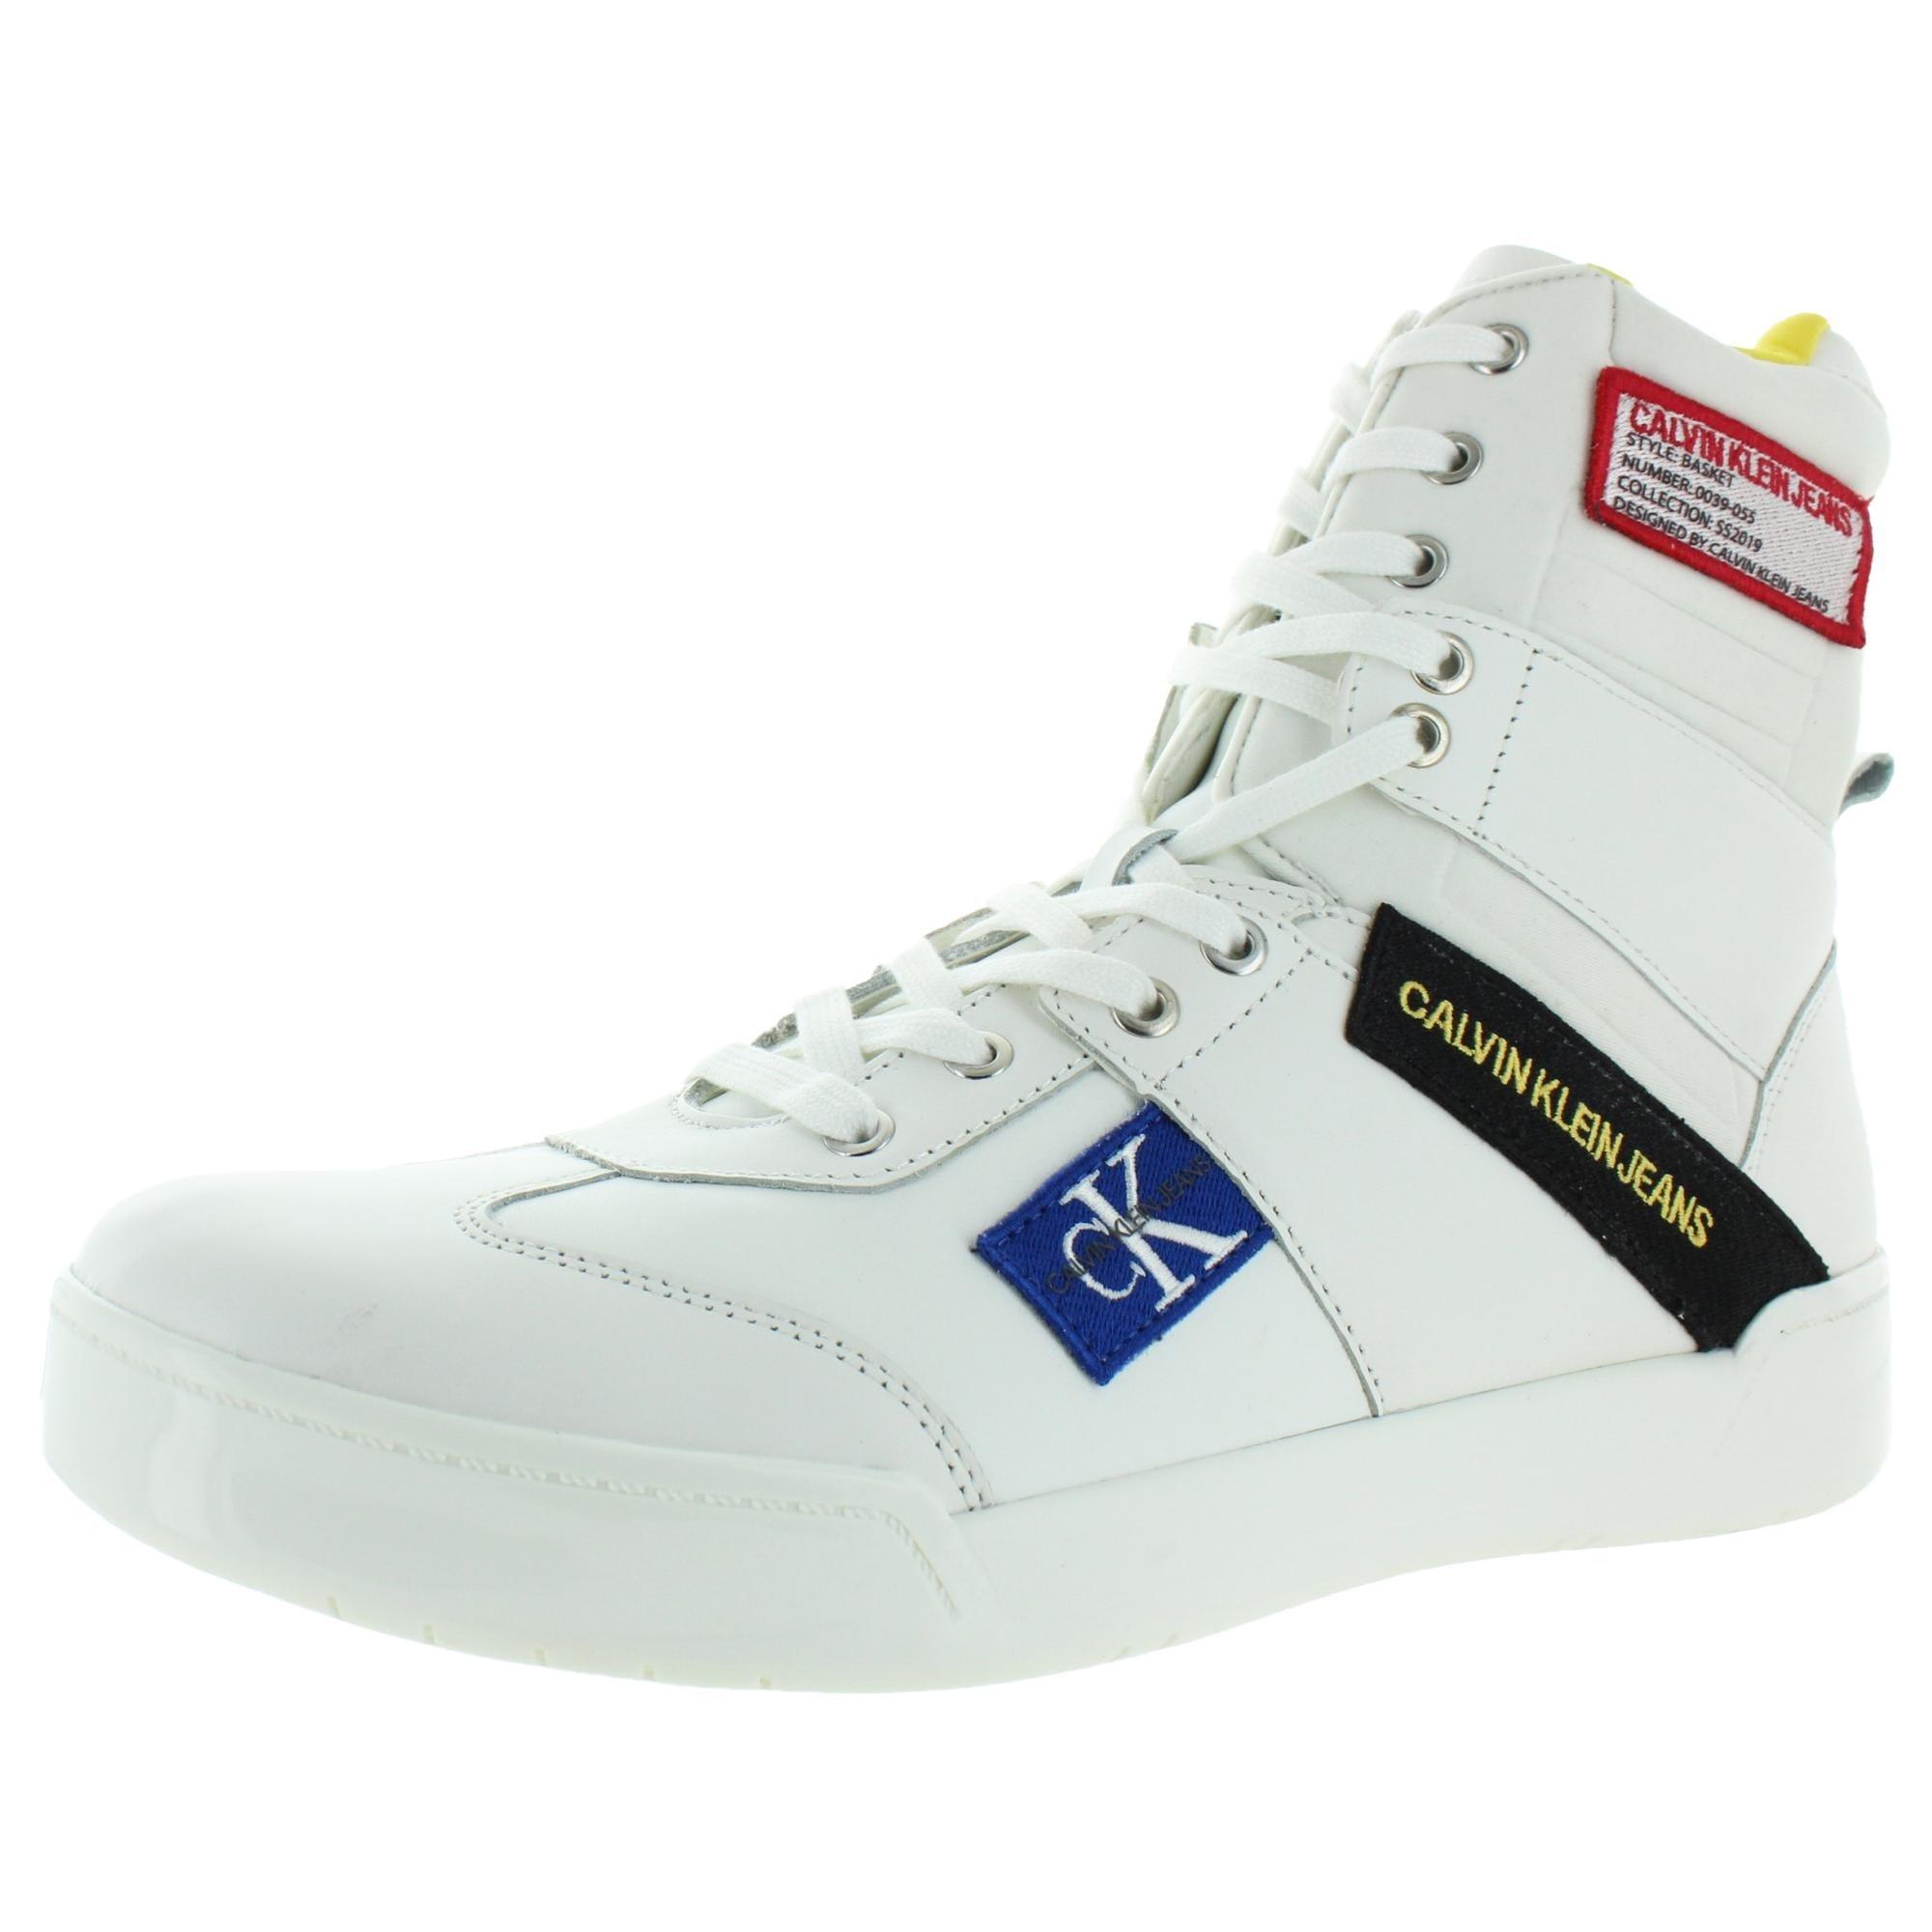 calvin klein jeans high top sneakers